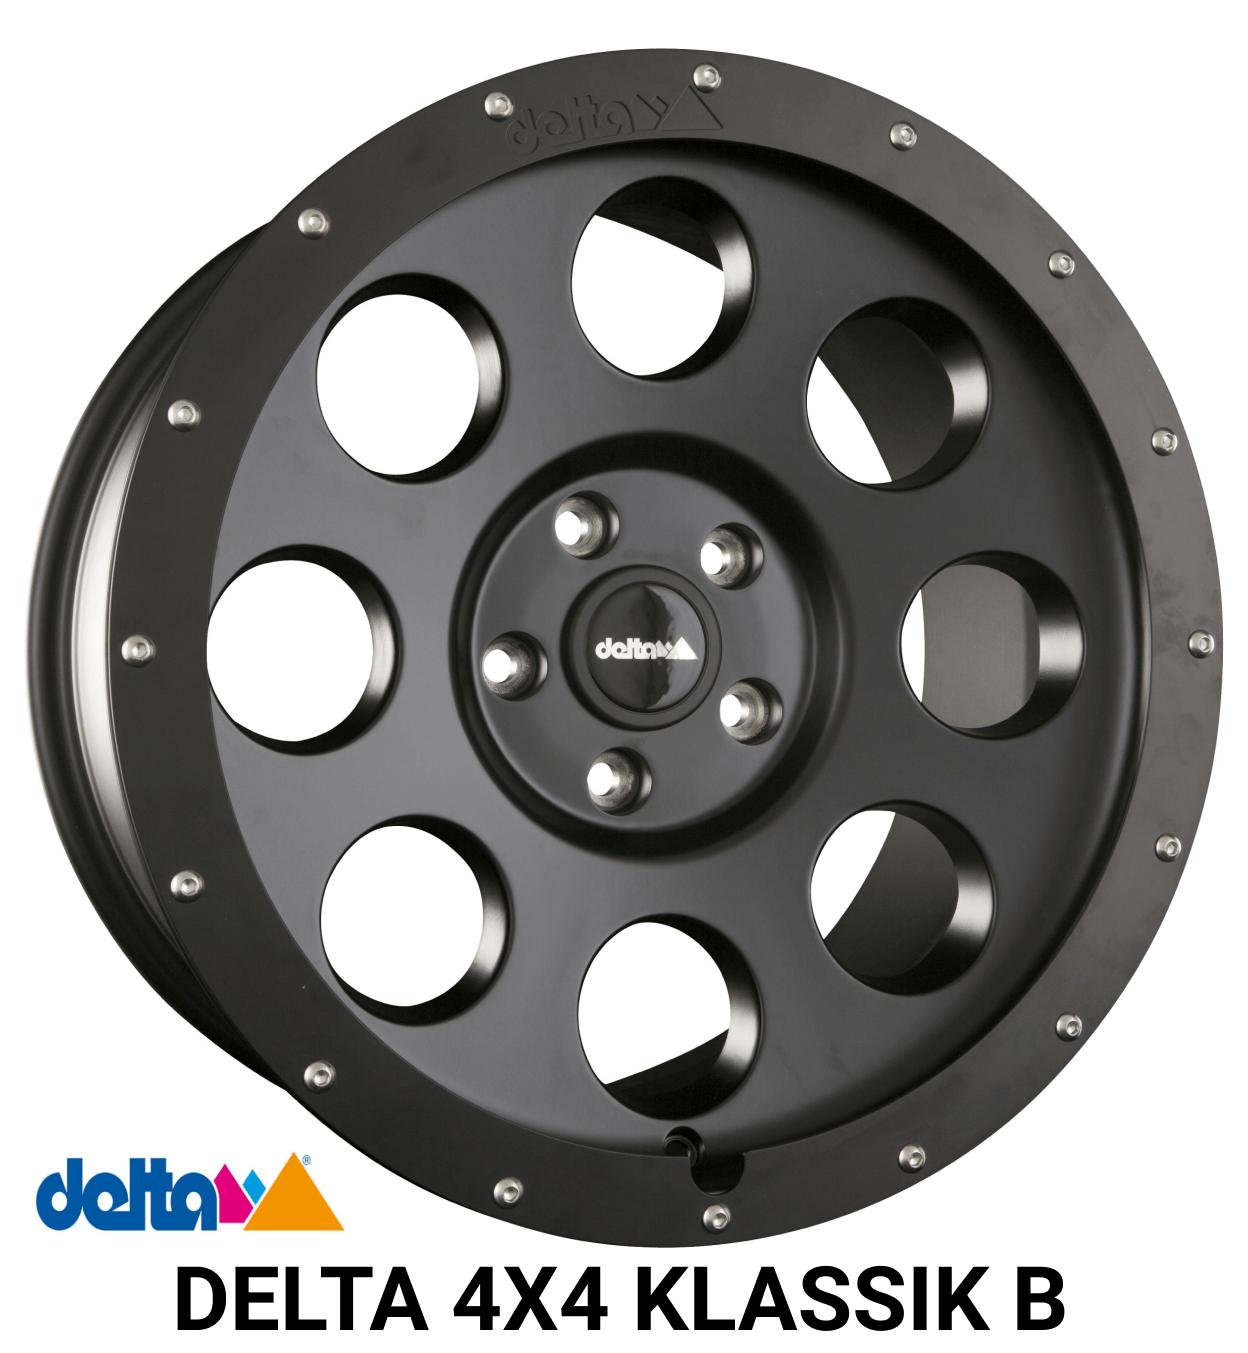 Delta 4x4 Klassik B Alufelge MB Sprinter Umbereifung